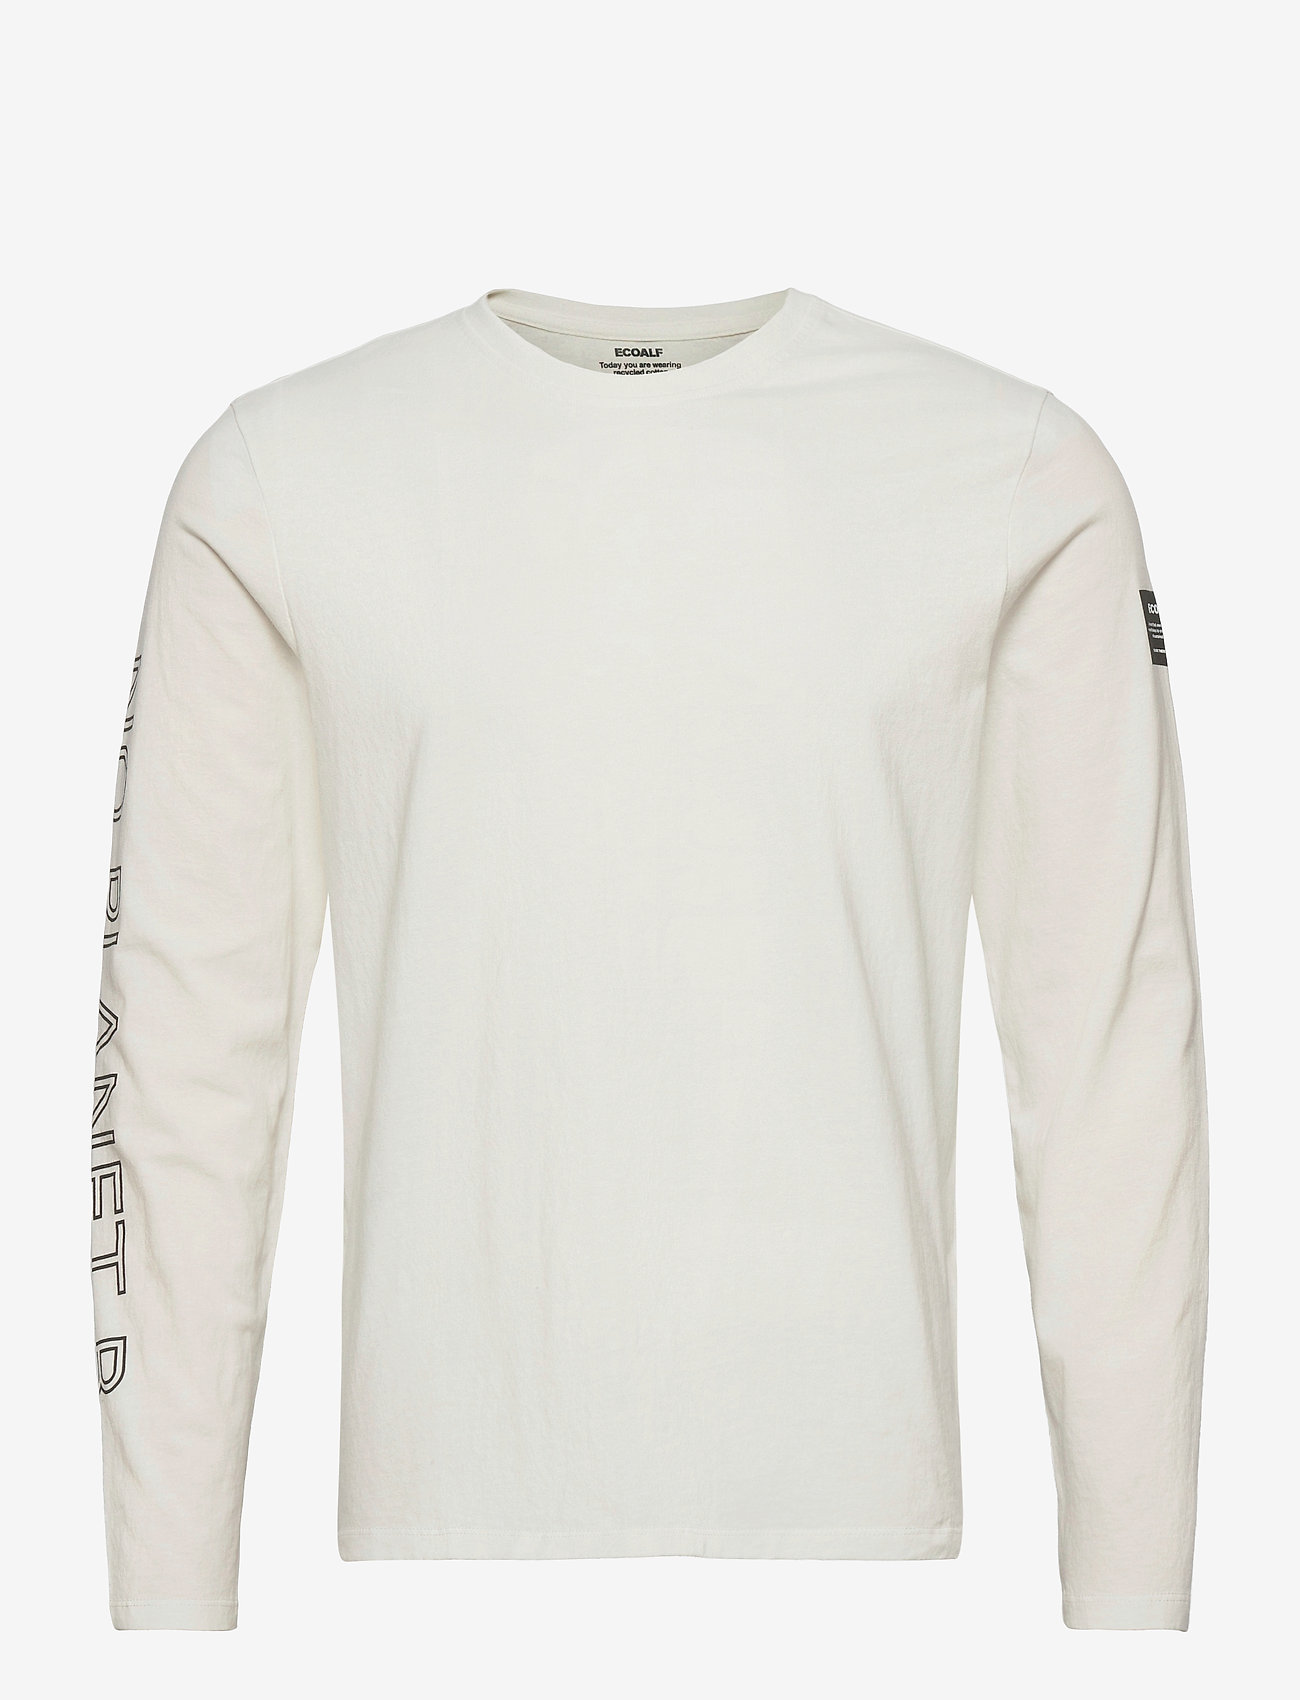 ECOALF - NANKIN LONG SLEEVE T-SHIRT MAN - t-shirts basiques - off white - 0